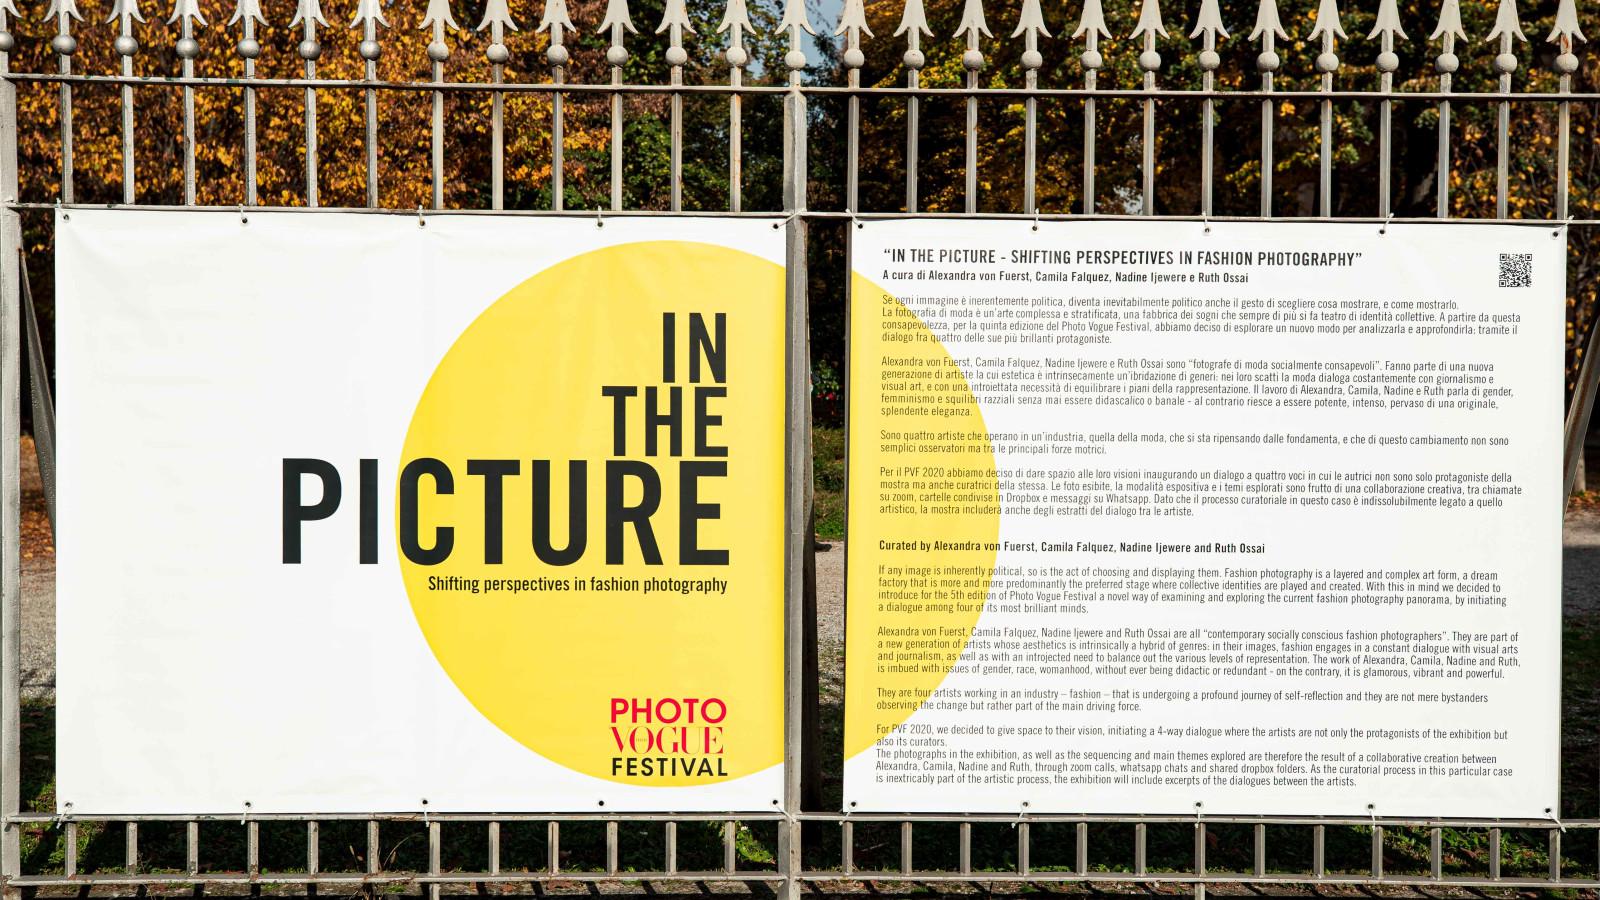 OPEN-AIR-EXHIBITION- -IN-THE-PICTURE---Benedetta-Malavasi---Italy---Photo-Vogue-Festival-small